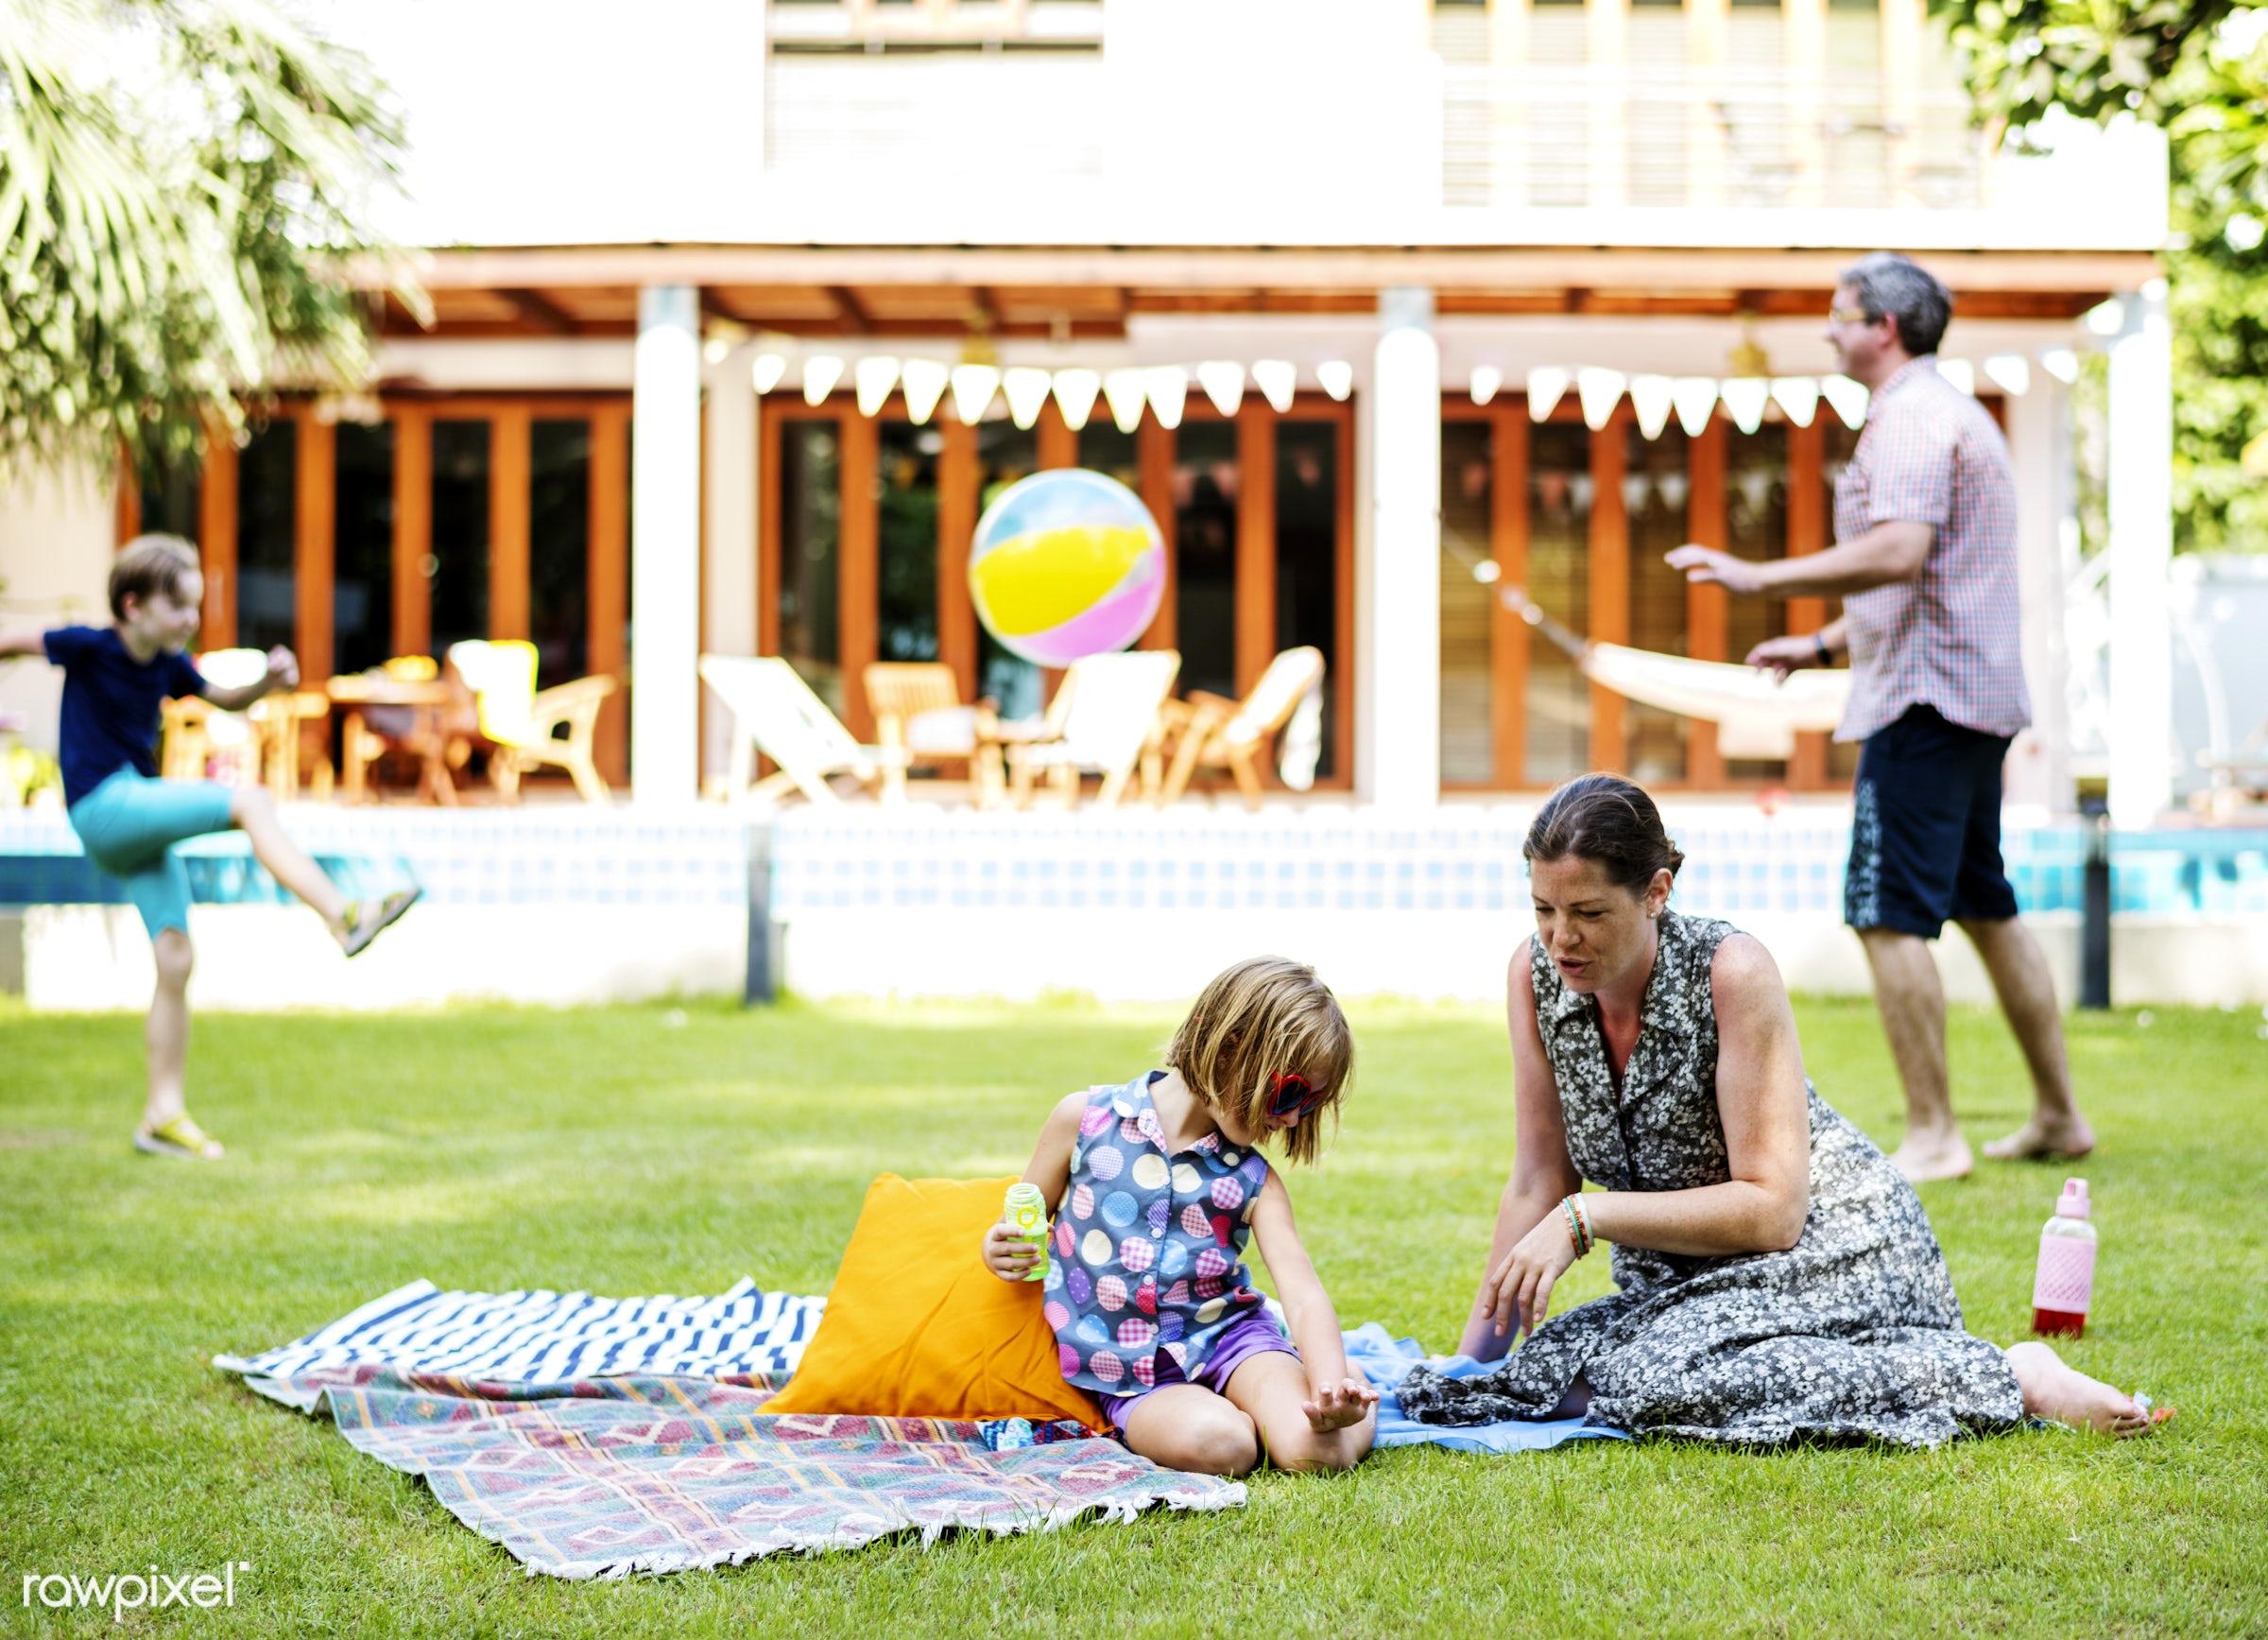 resort, activity, beachball, bonding, cheerful, child, girl, grass, home, kid, leisure, love, outdoors, parents, people,...